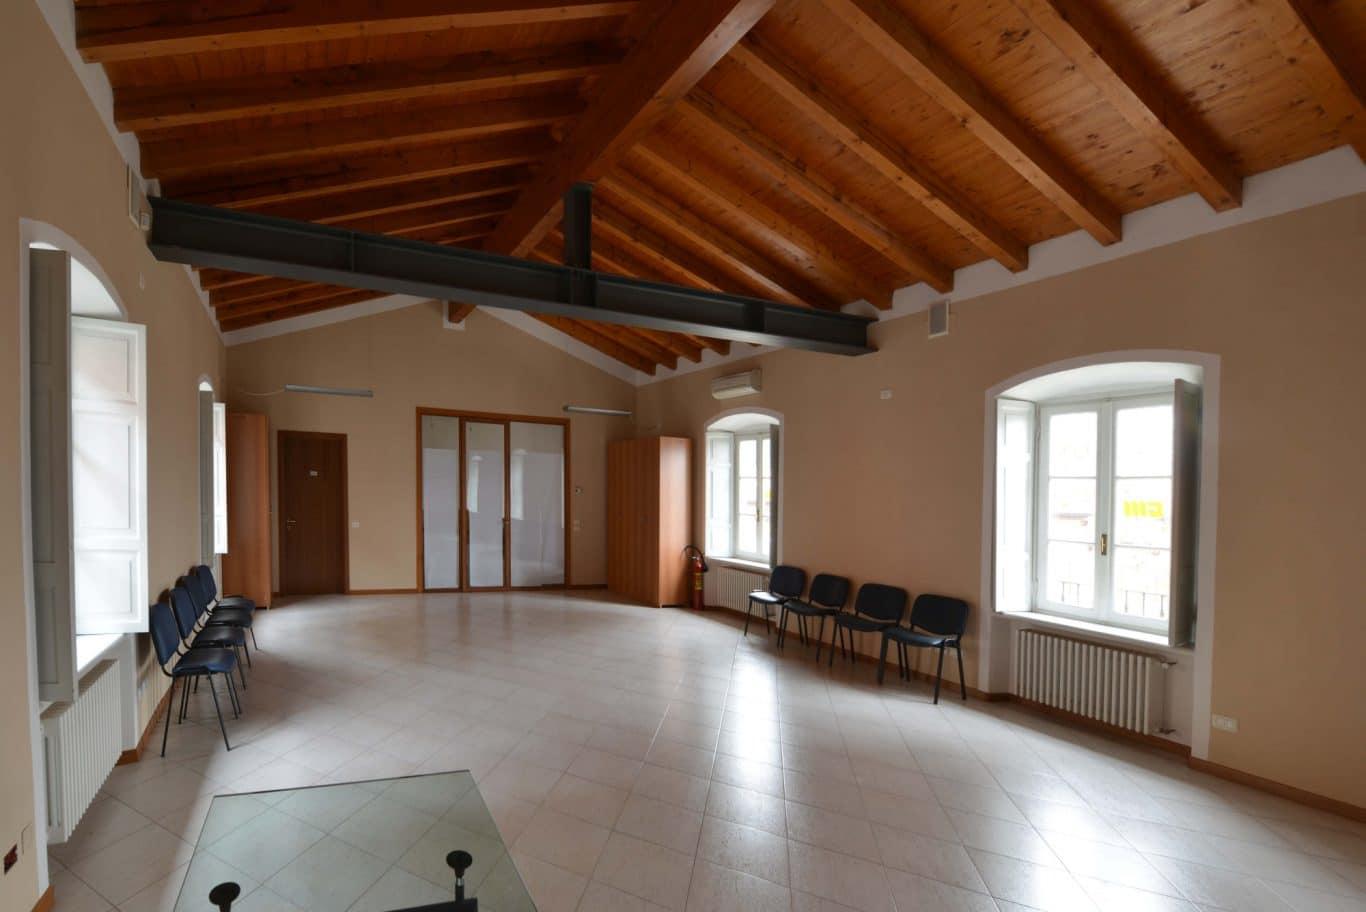 Atelier vecchie terme trescore balneario bergamo area for Loft bergamo affitto